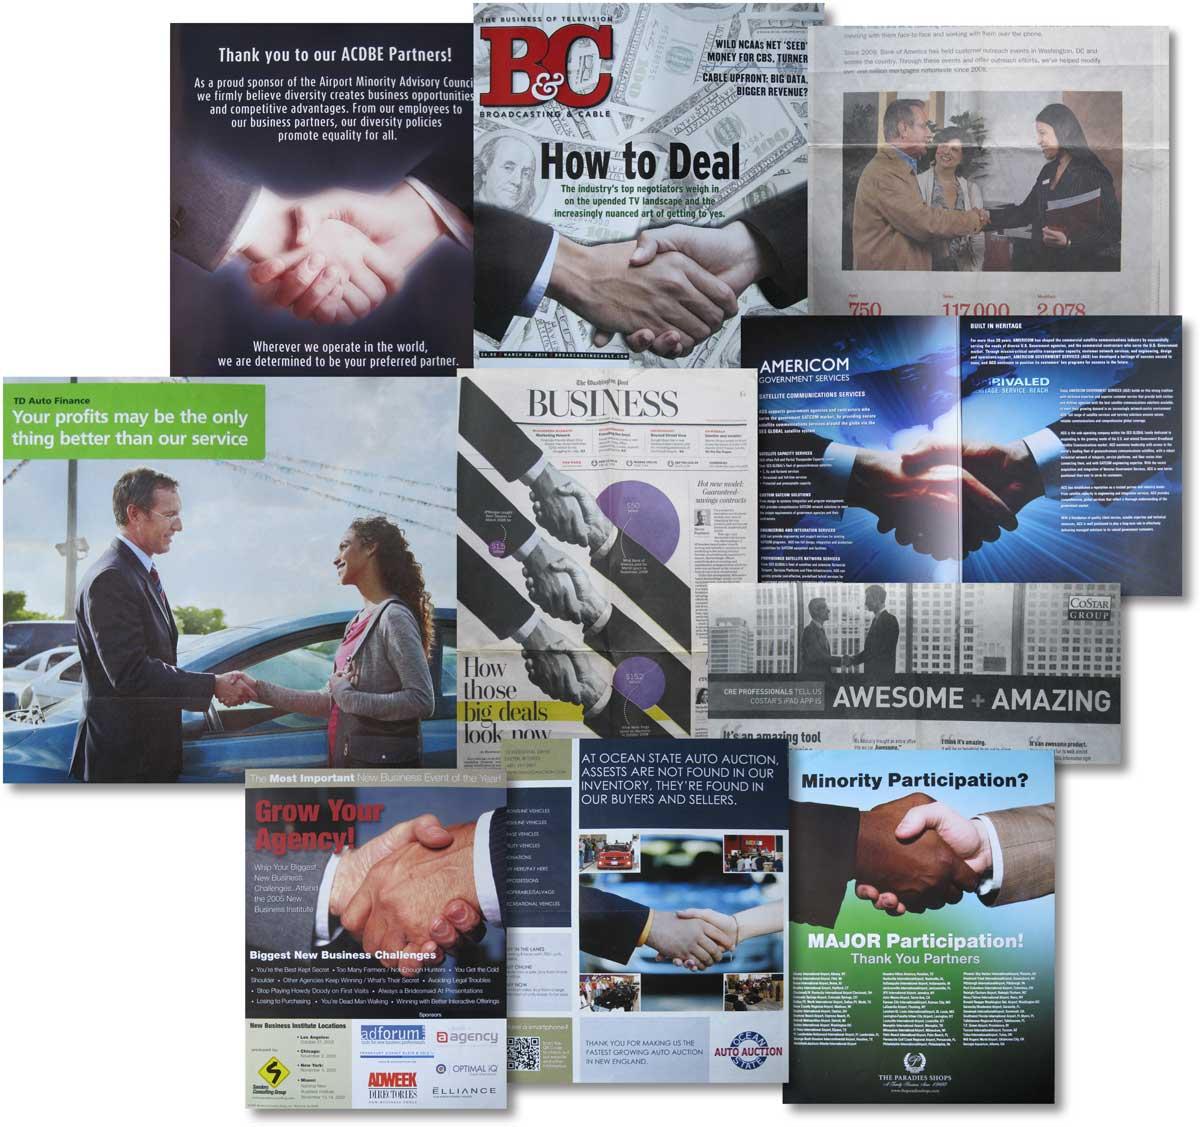 Handshake Ads